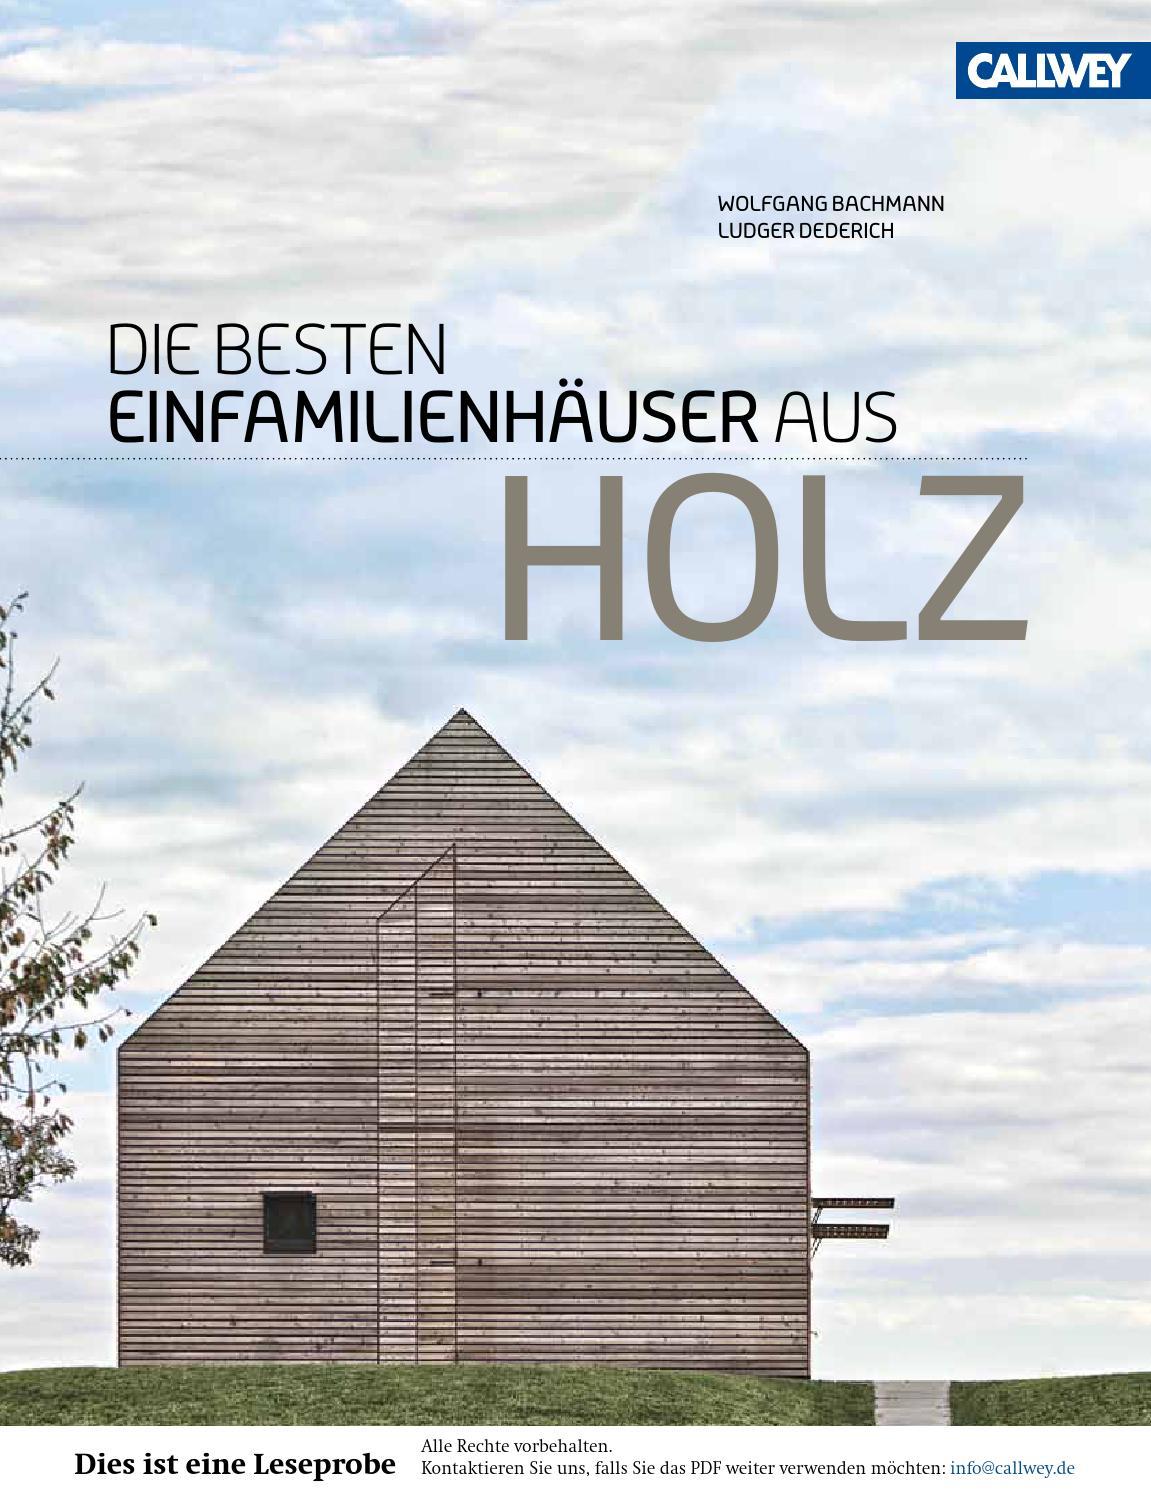 bachmann die besten einfamilienhaeuser aus holz callwey. Black Bedroom Furniture Sets. Home Design Ideas